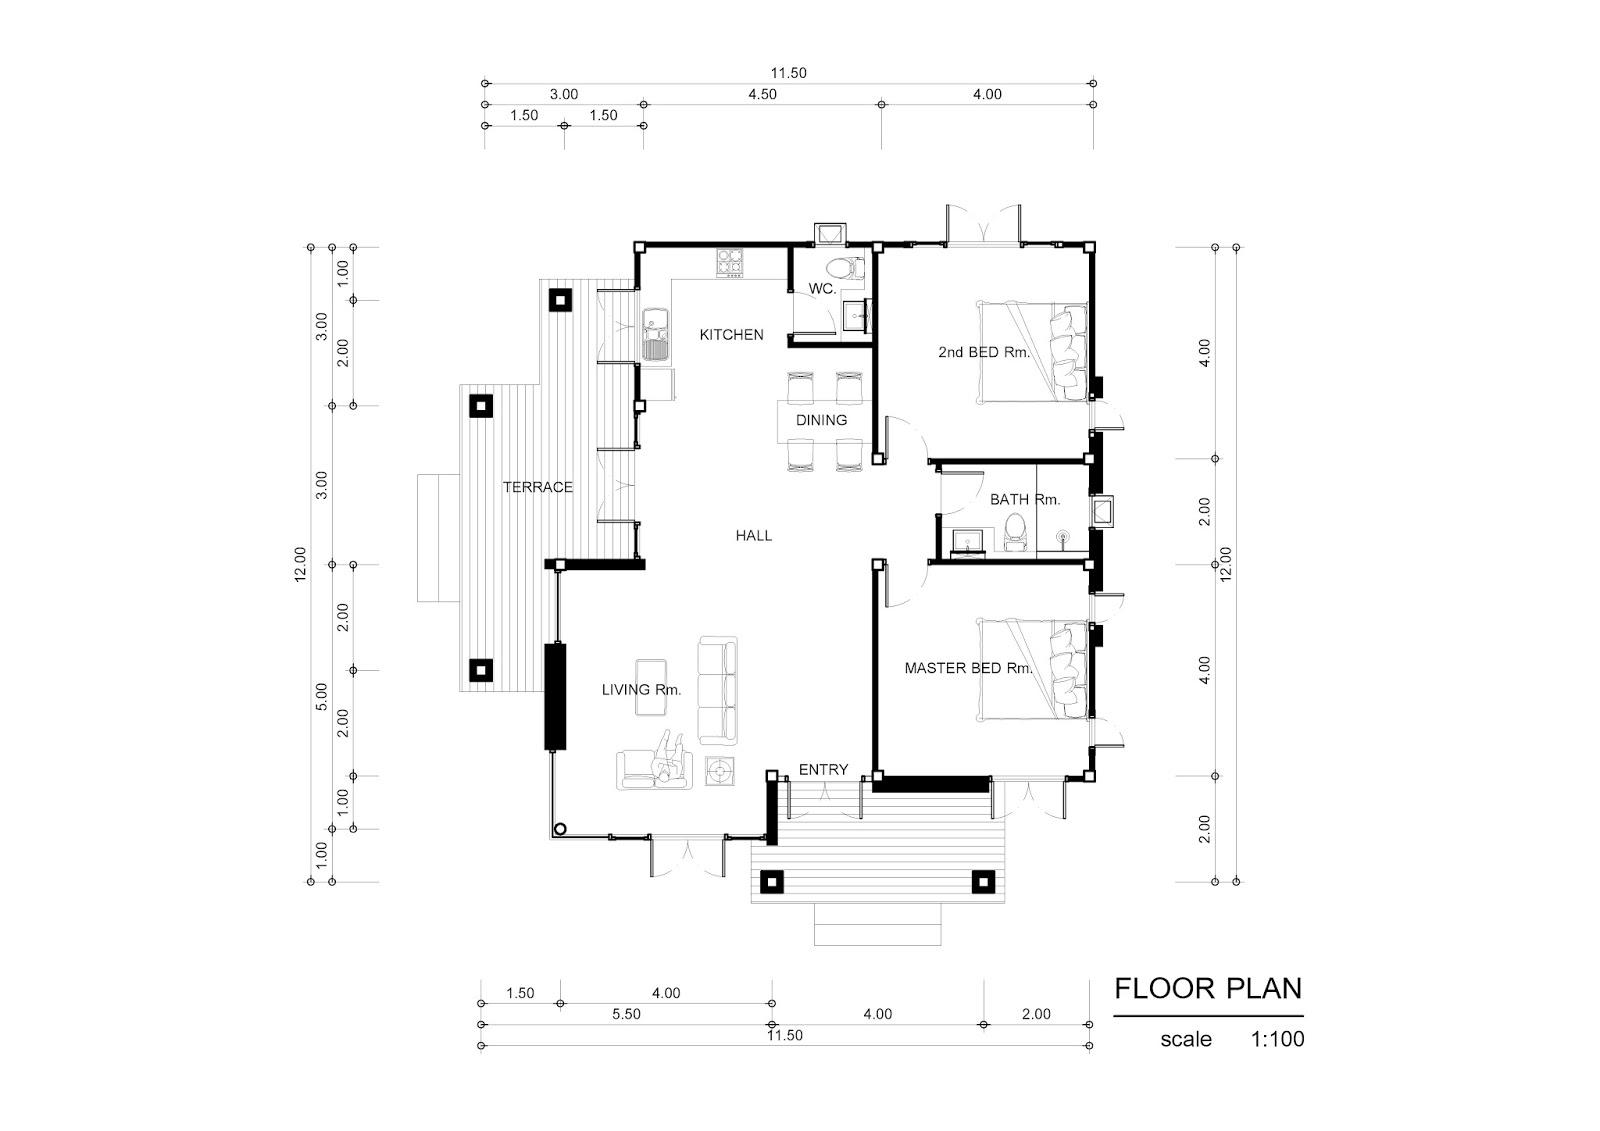 Floor Plan Drawing แบบบ้านชั้นเดียว 2 ห้องนอน 2 ห้องน้ำ งบล้านต้นๆ บ้าน แบบ